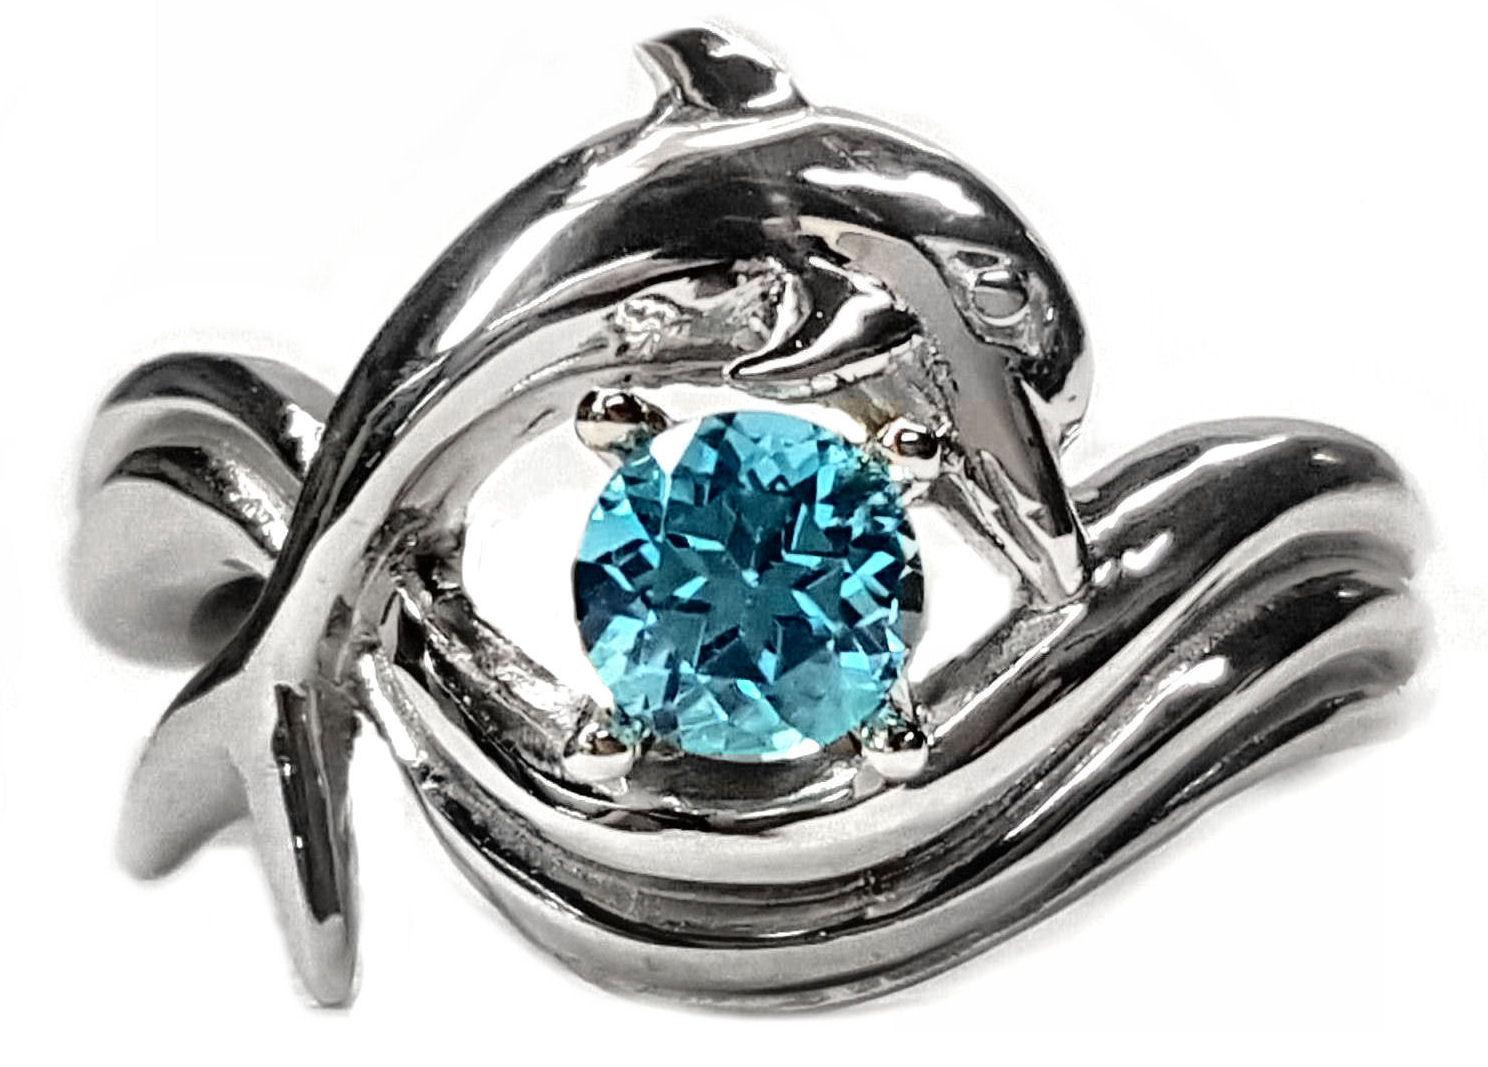 The Dolphin Bridal Jewelry Store Ssjewels Com